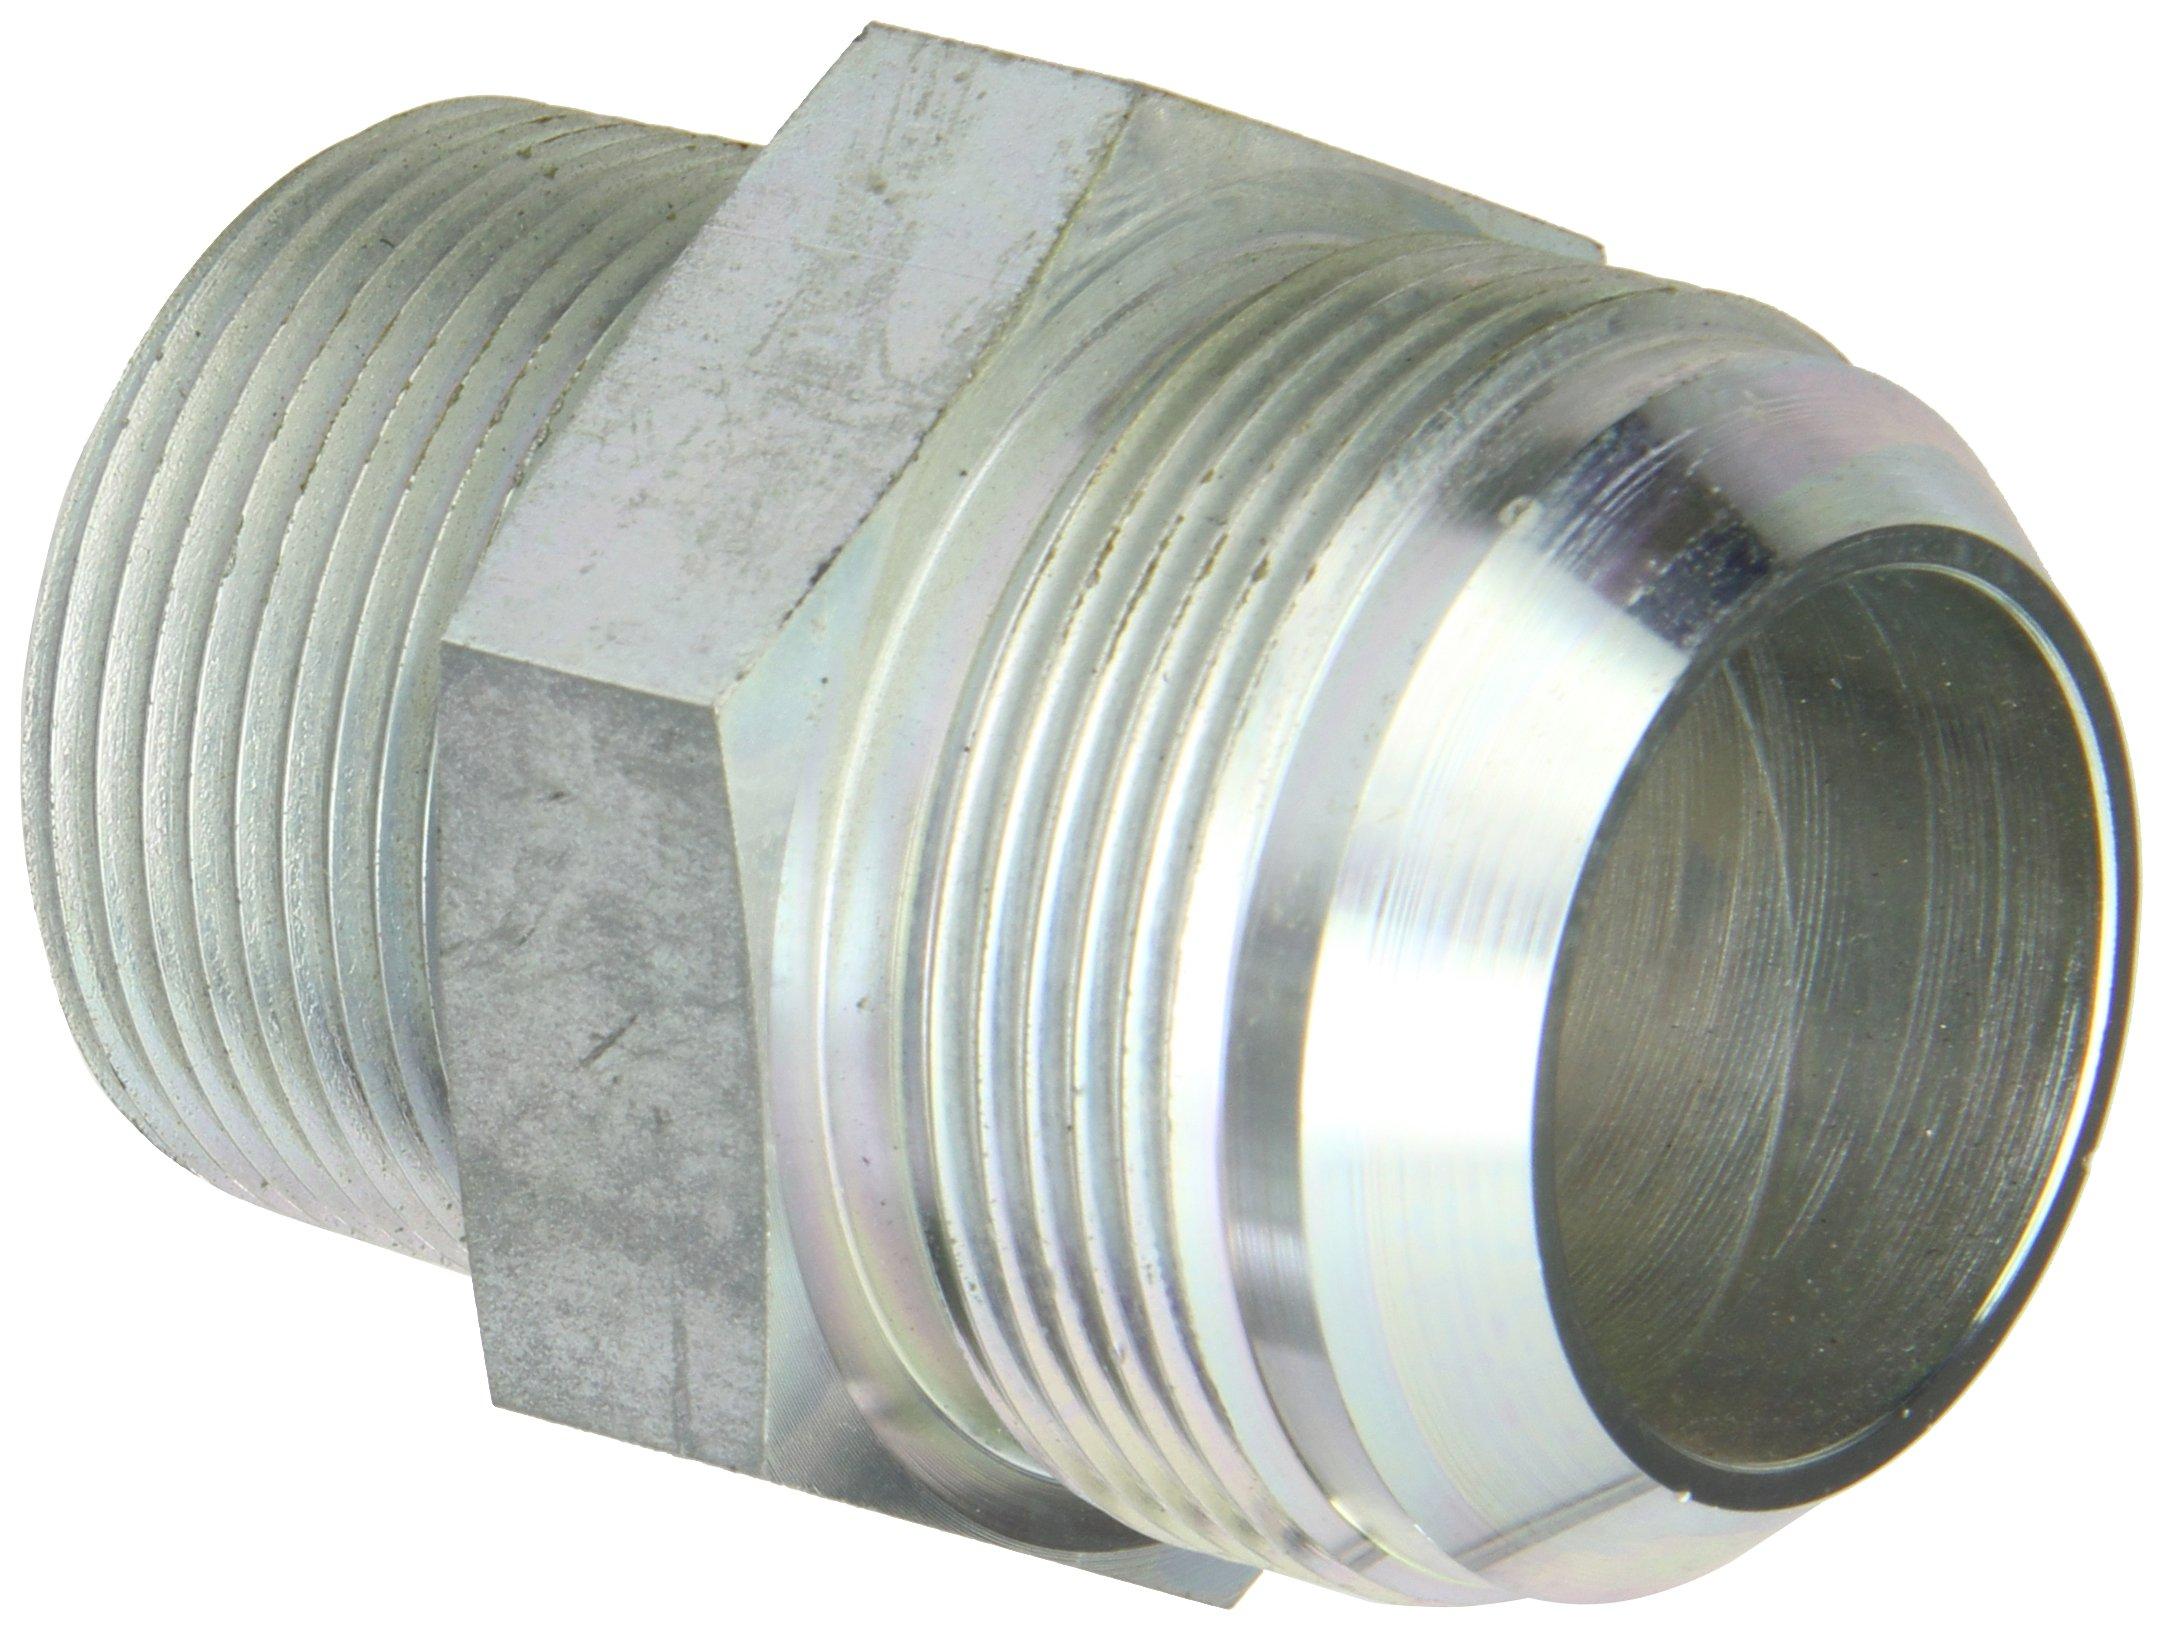 Eaton Aeroquip 2021-20-24S Male Connector, Male 37 Degree JIC, Male Pipe Thread, JIC 37 Degree & NPT End Types, Carbon Steel, 1-1/2 JIC(m) x 1-1/4 NPT(m) End Size, 1-1/2'' Tube OD